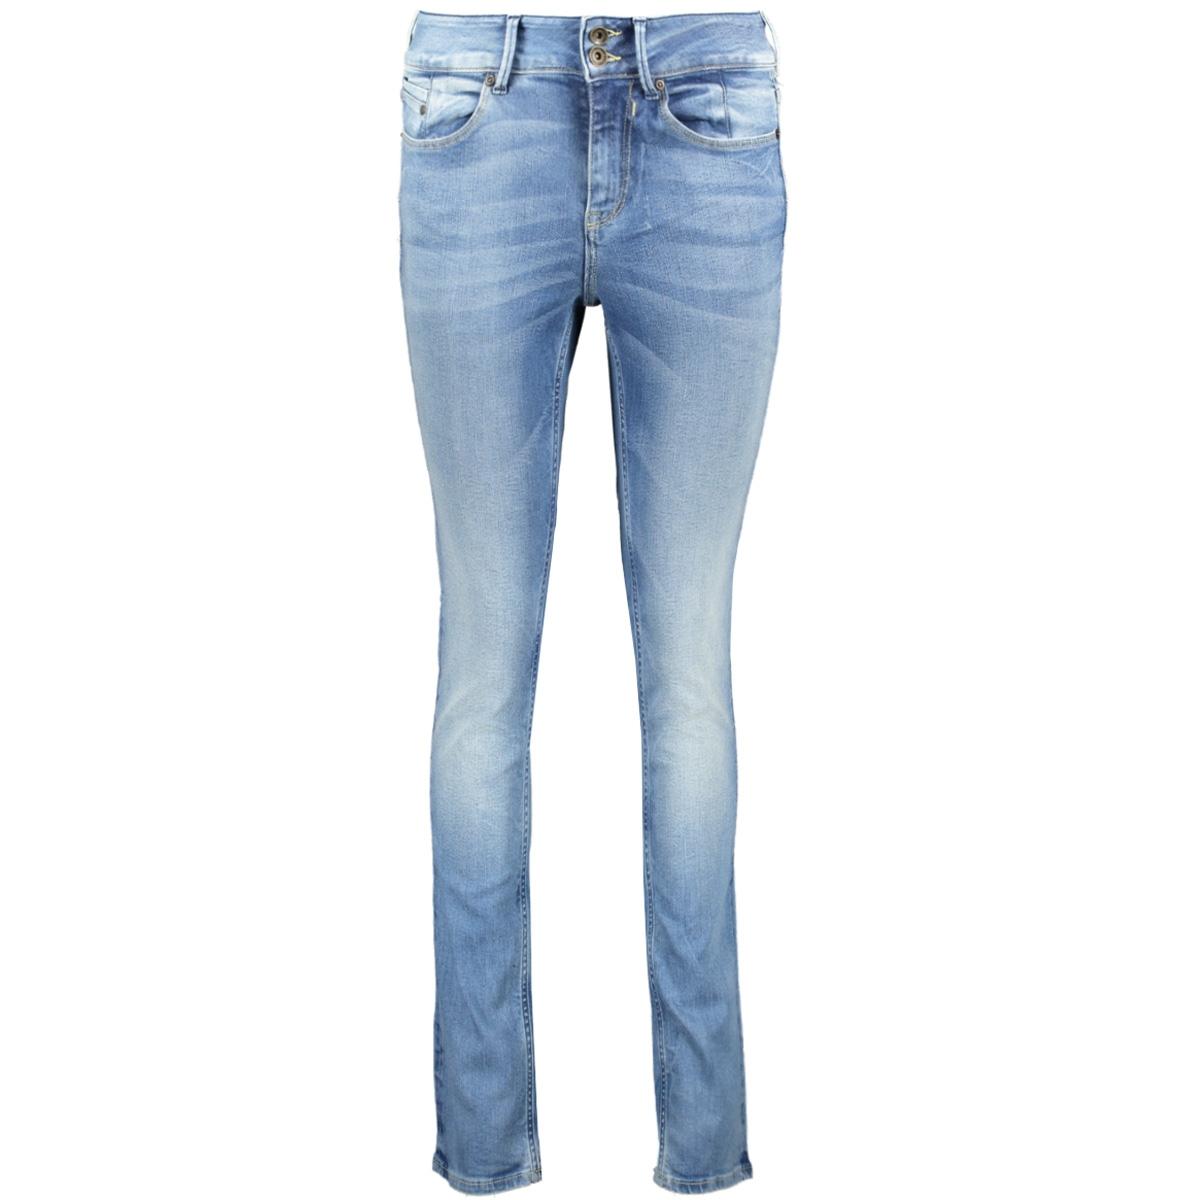 285 caro garcia jeans 2669 vintage used